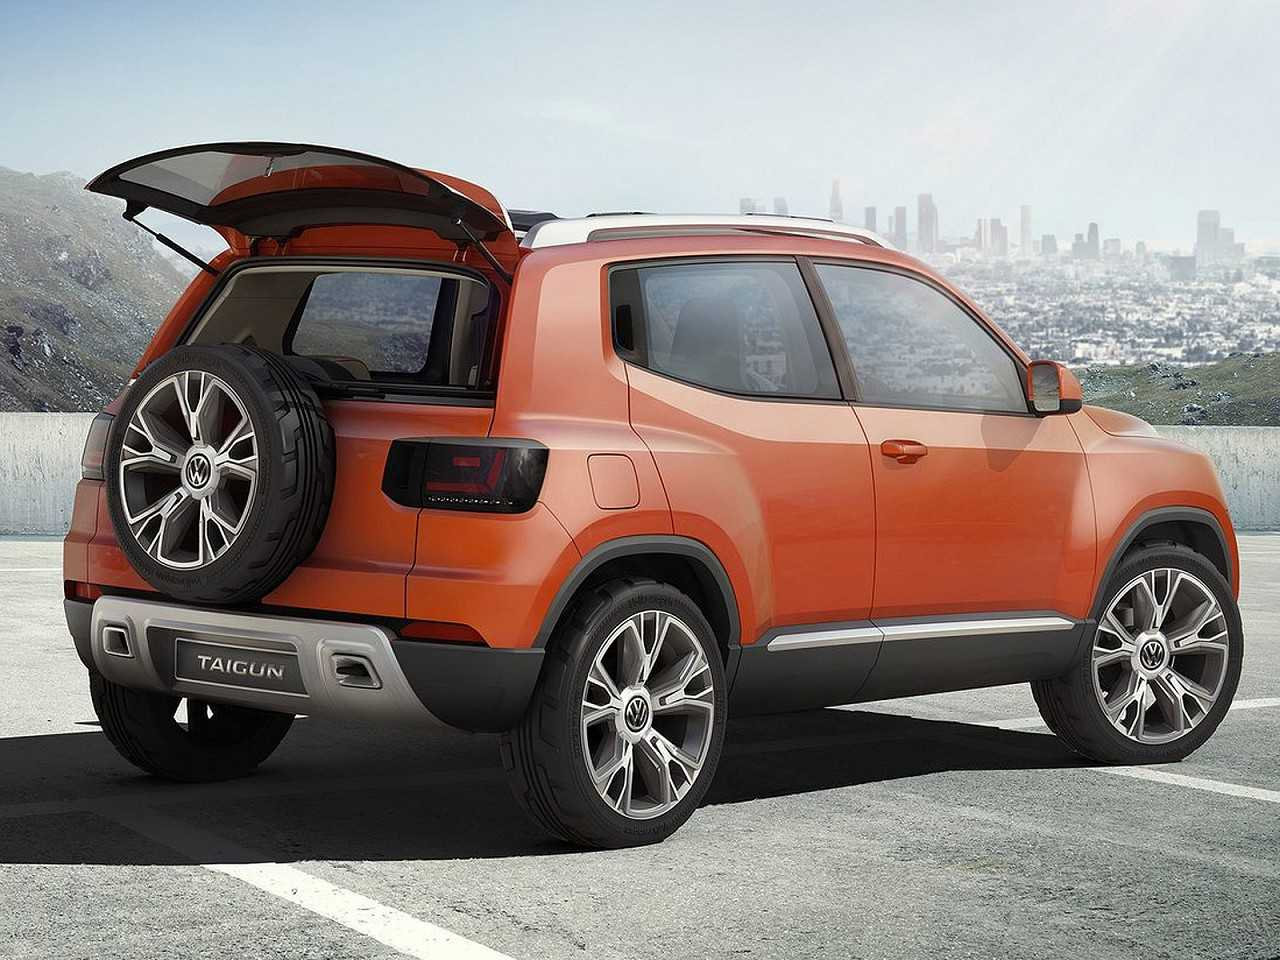 Acima o Taigun Concept de 2014, um exemplo do que podemos esperar do SUV subcompacto da VW